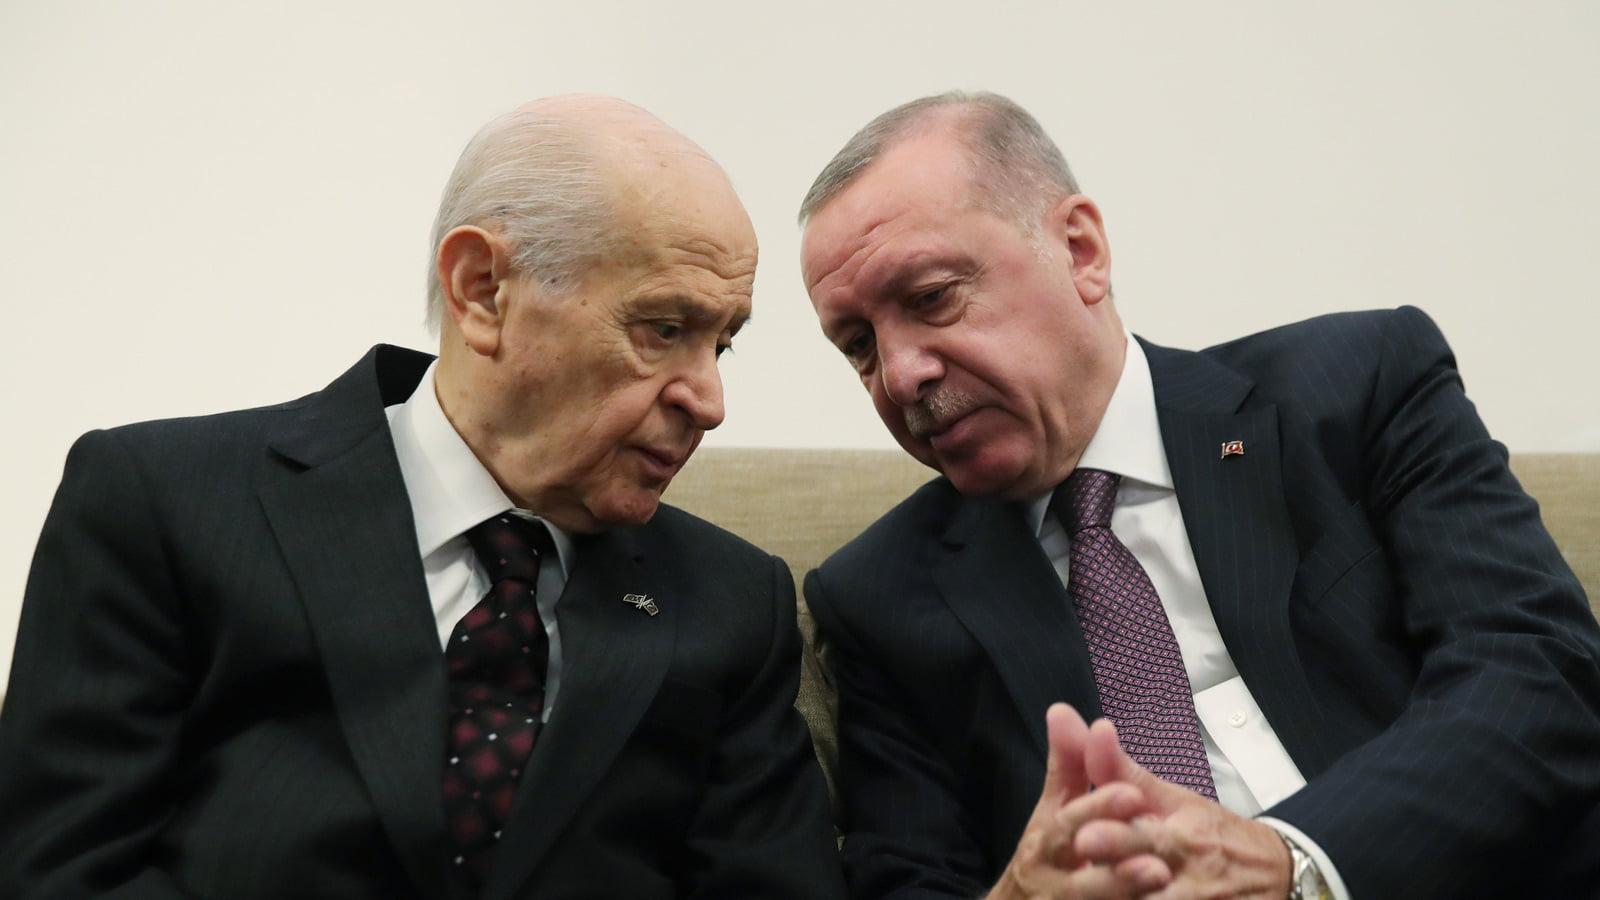 Handelsblatt: «Τουρκία – οι τουρίστες ως πολιτικοί όμηροι» – Τι κρύβει η ταξιδιωτική απαγόρευση της Γερμανίας για την Τουρκία;